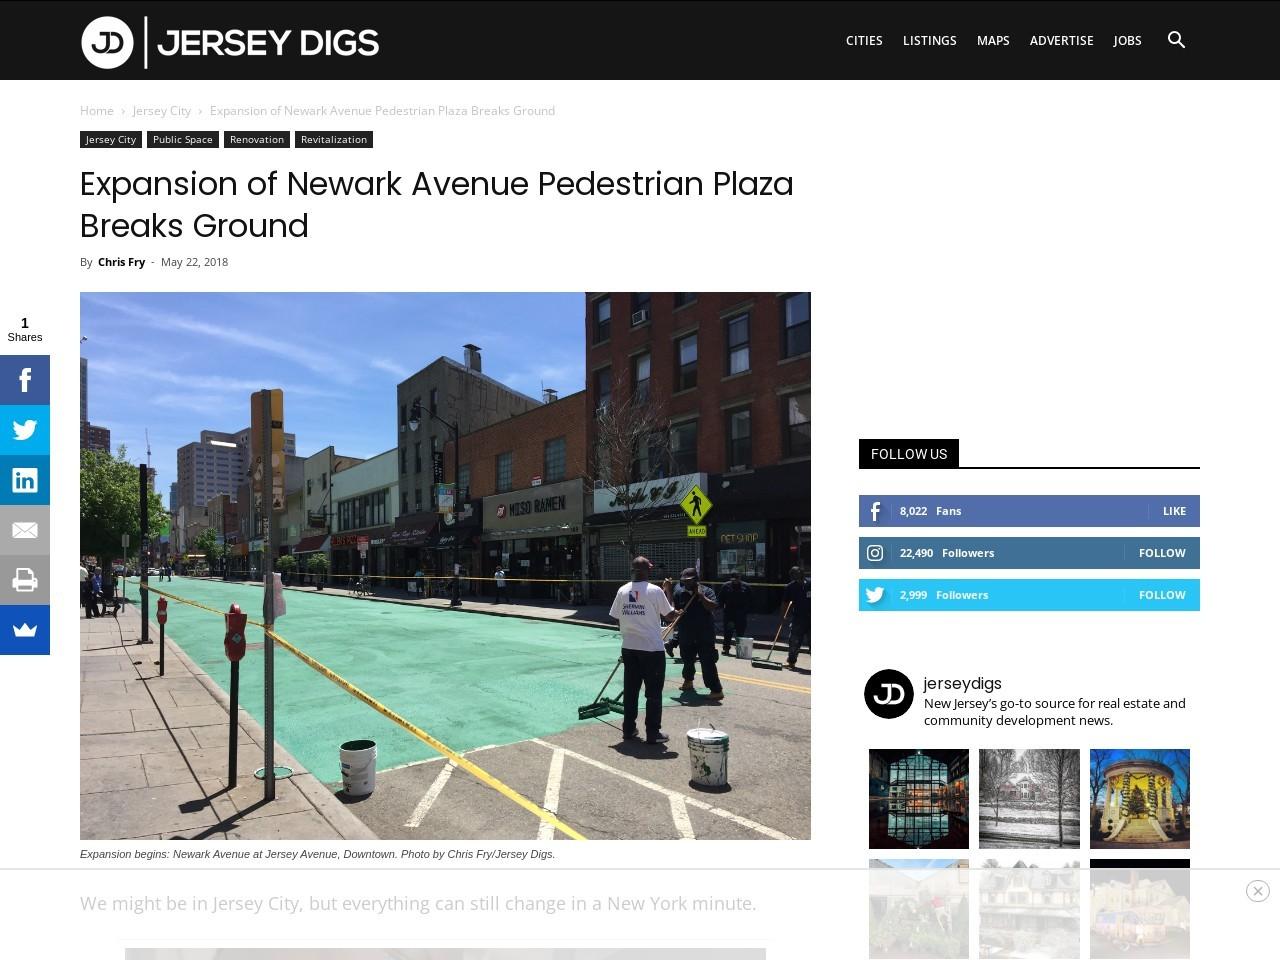 Expansion of Newark Avenue Pedestrian Plaza Breaks Ground